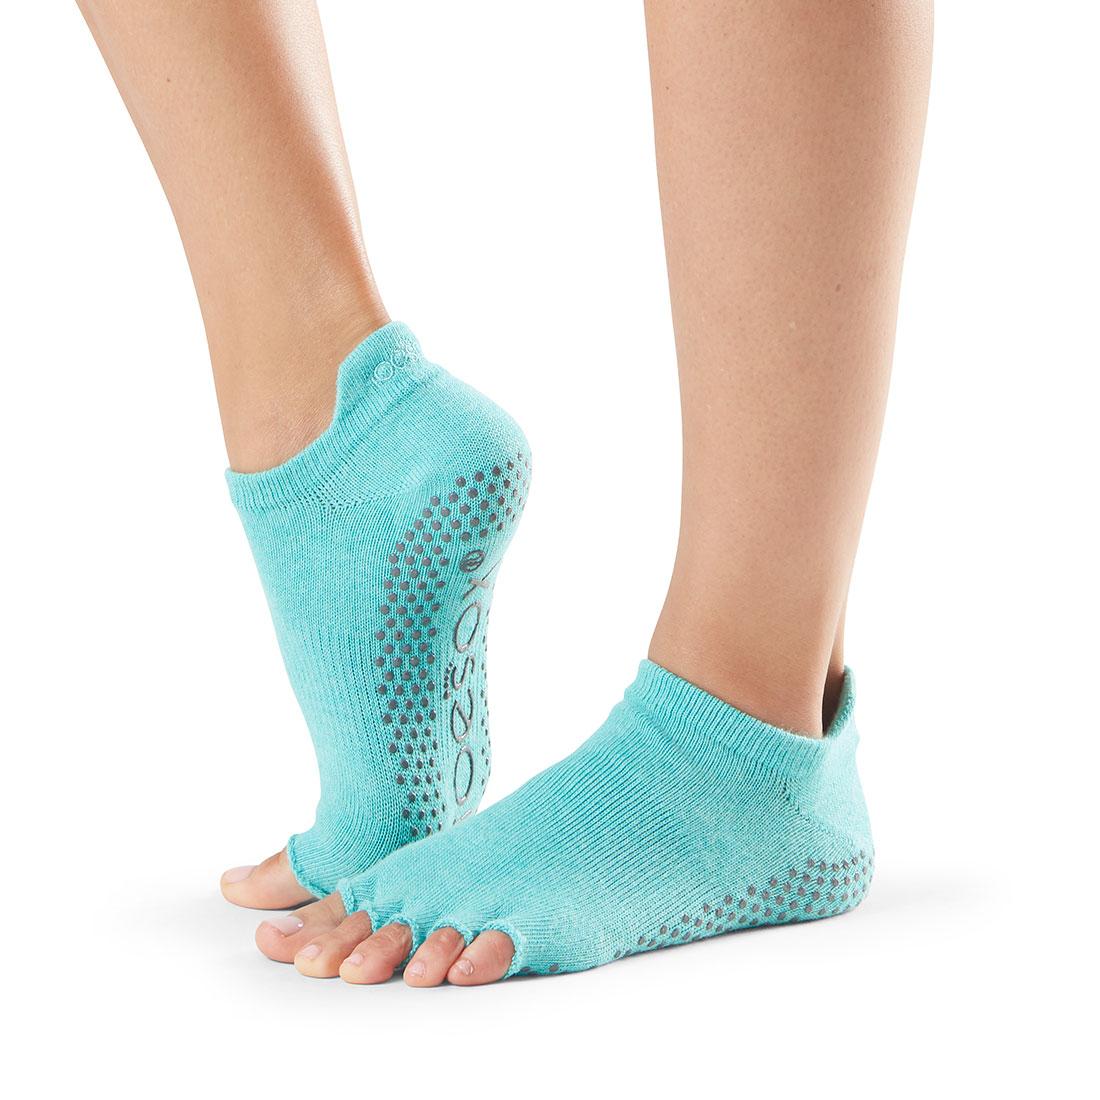 Yogasocken ToeSox Low Rise Half Toe Aqua - 1